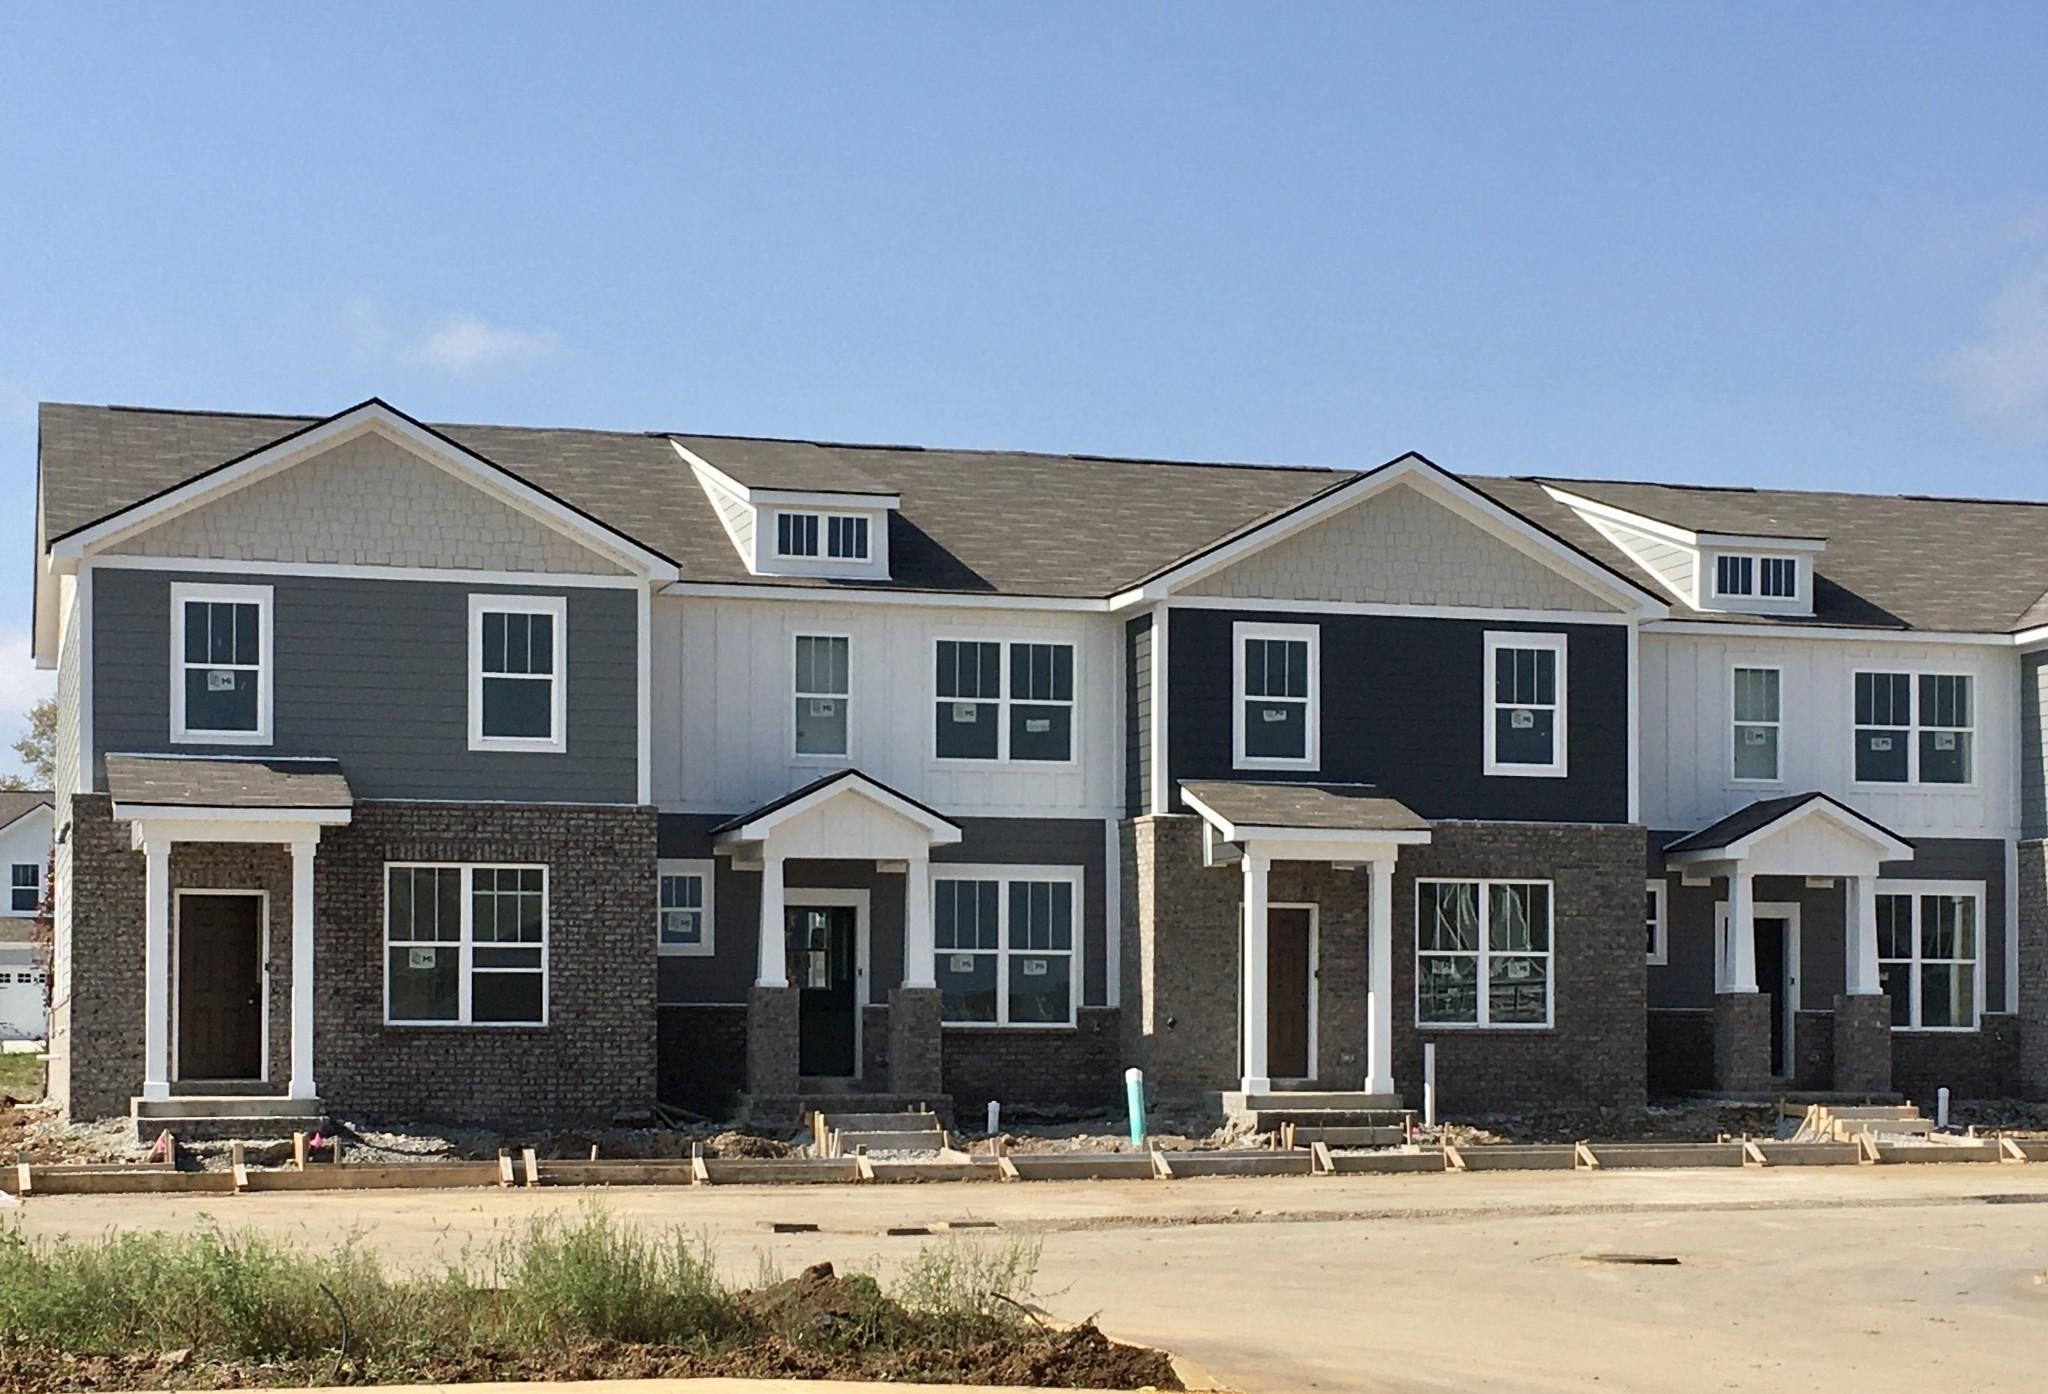 1707 Frodo Way (82) #82 Property Photo - Murfreesboro, TN real estate listing